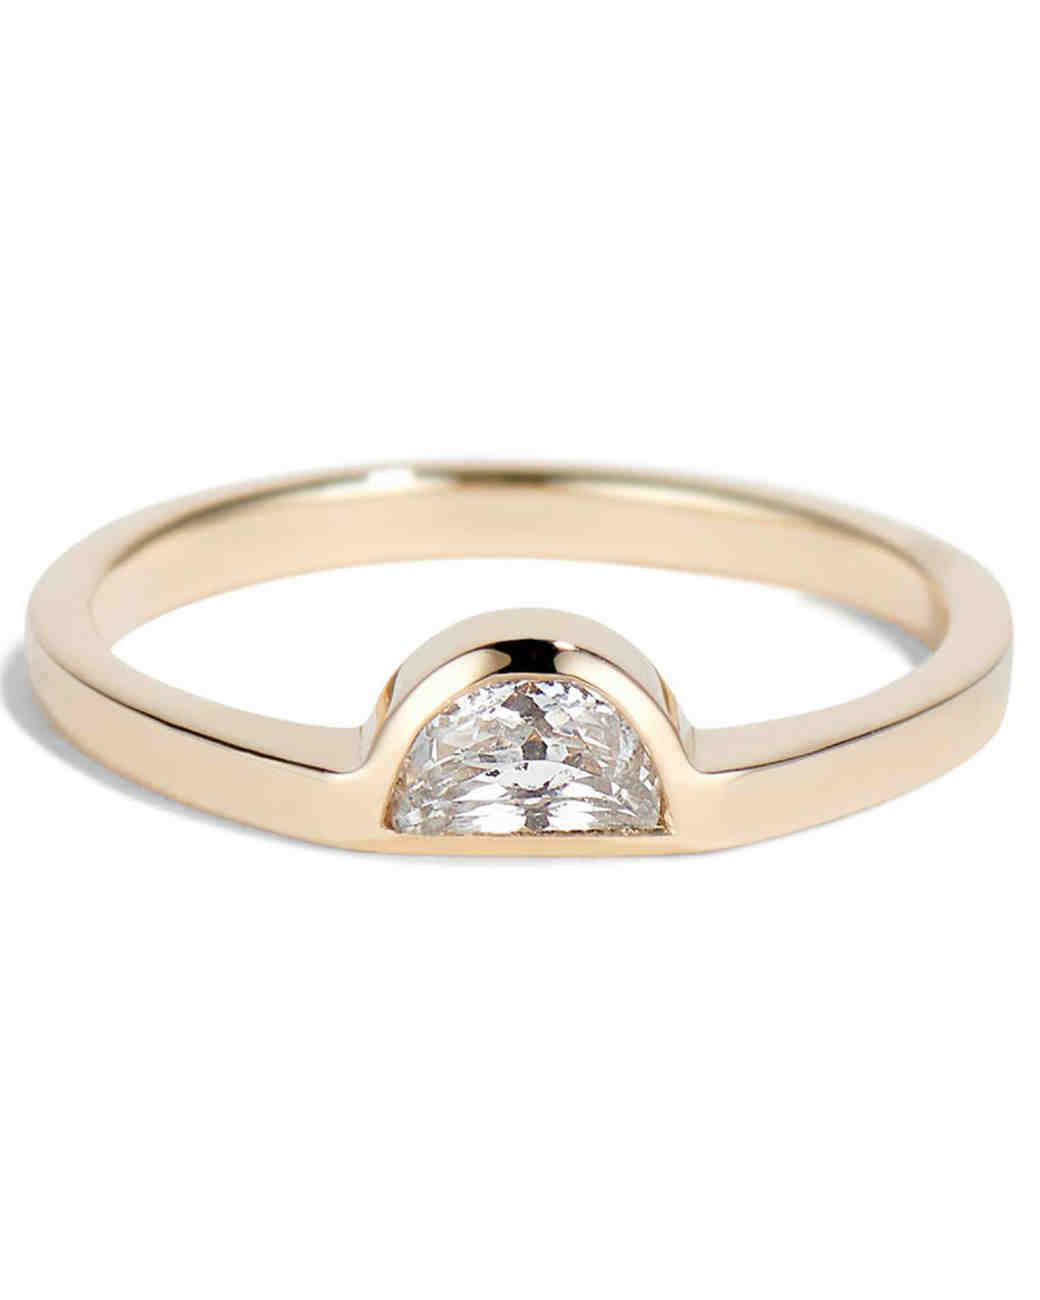 Bario Neal Half-Moon White Sapphire Ring